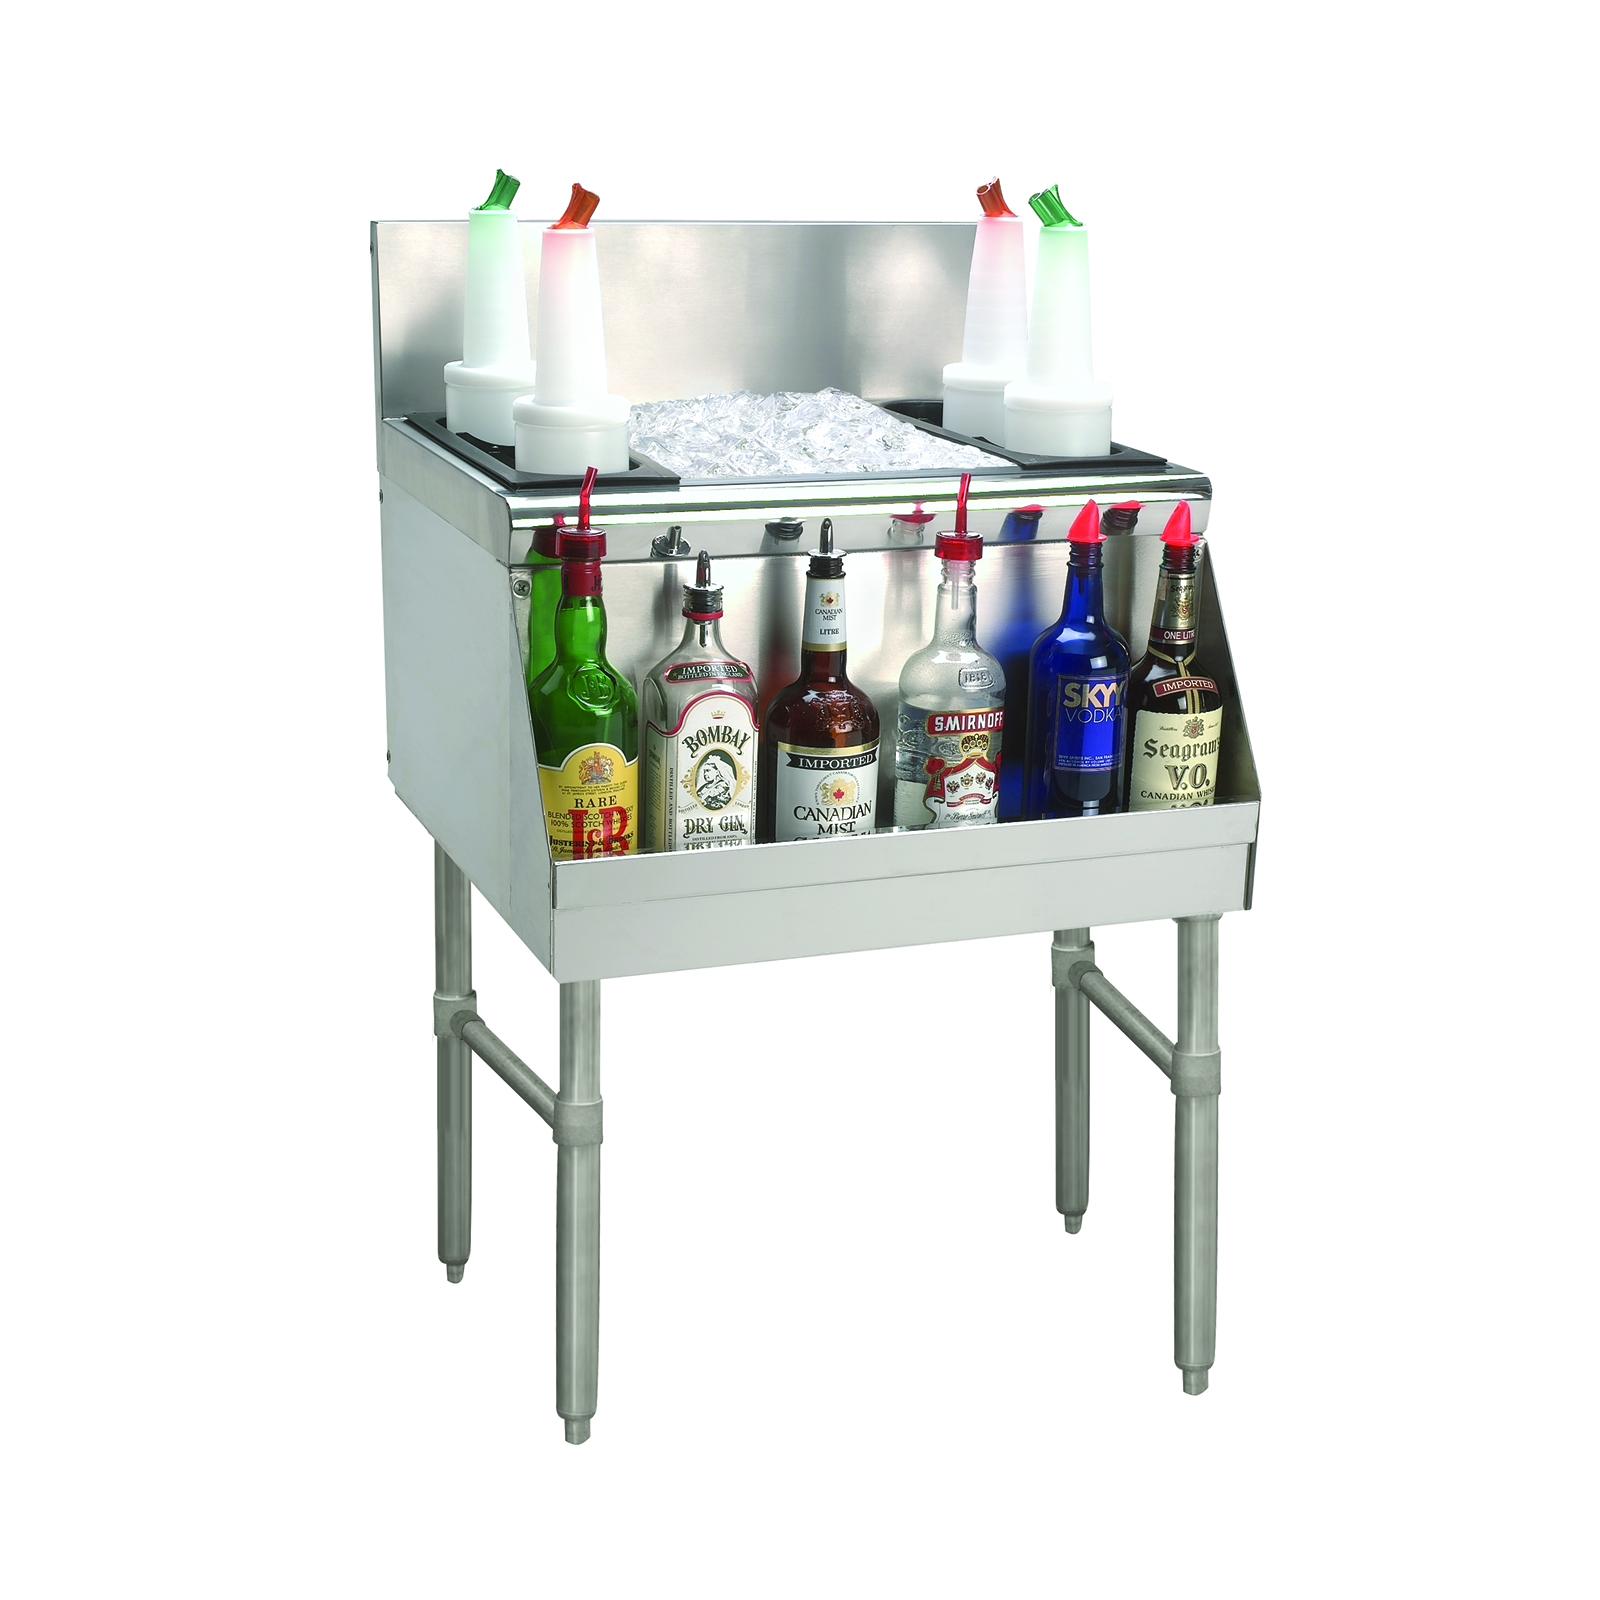 Advance Tabco PRI-24-36D underbar ice bin/cocktail unit